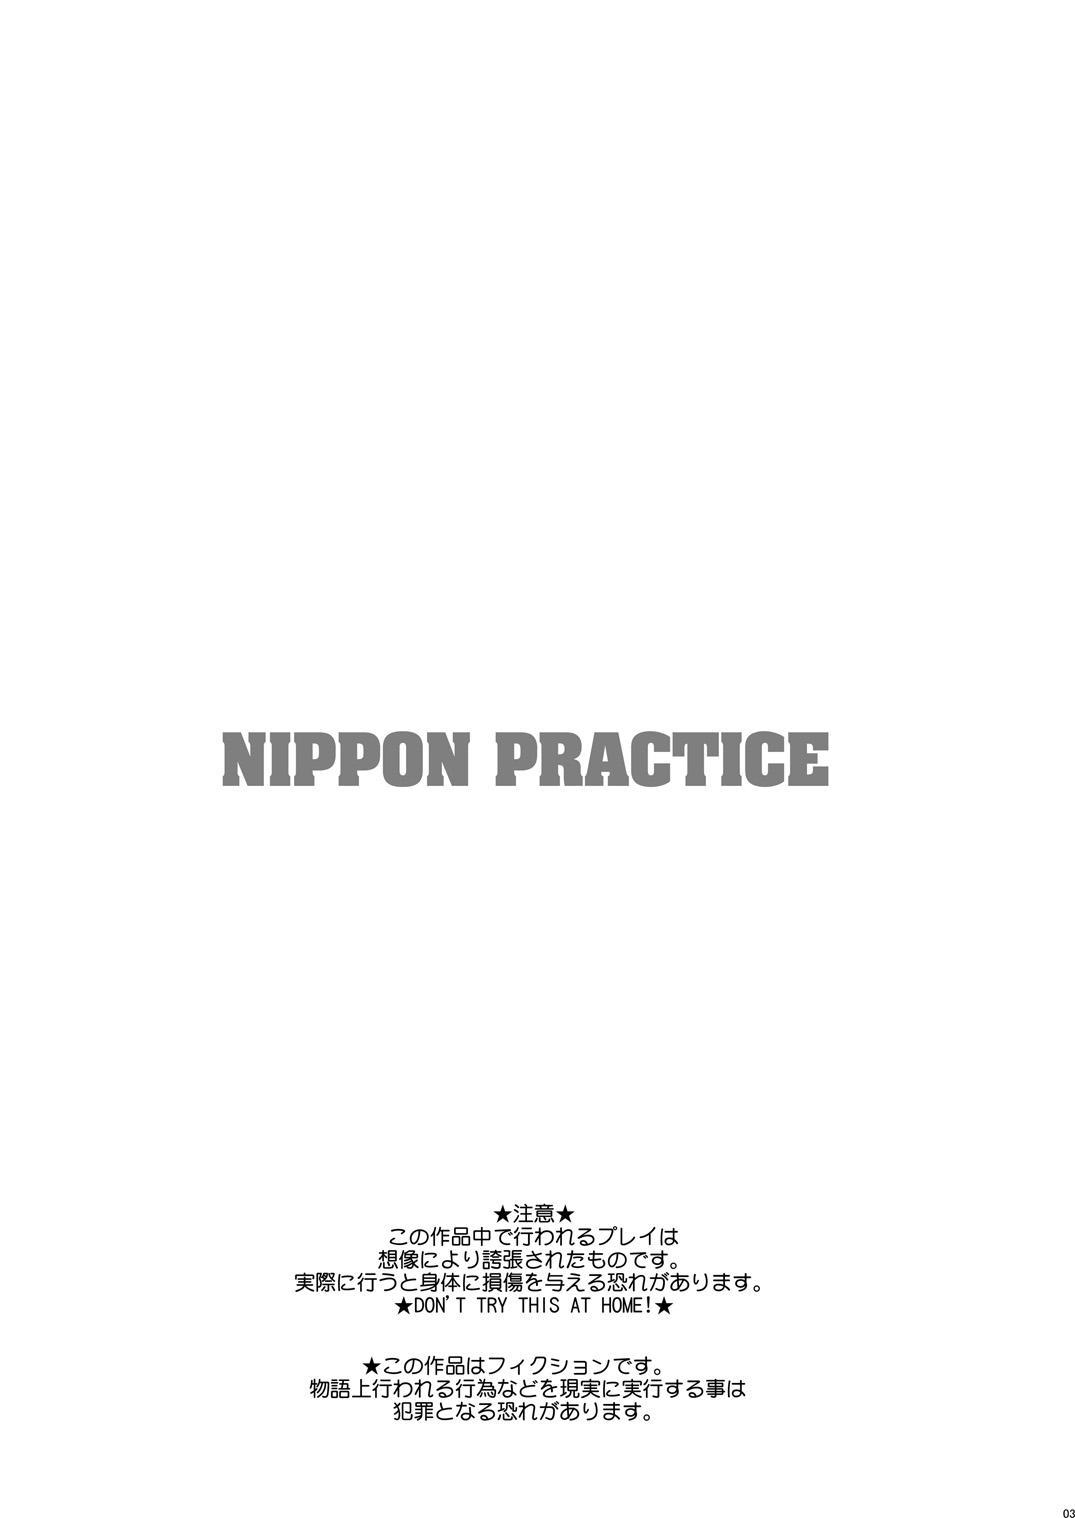 NIPPON PRACTICE 1 DLver. 1